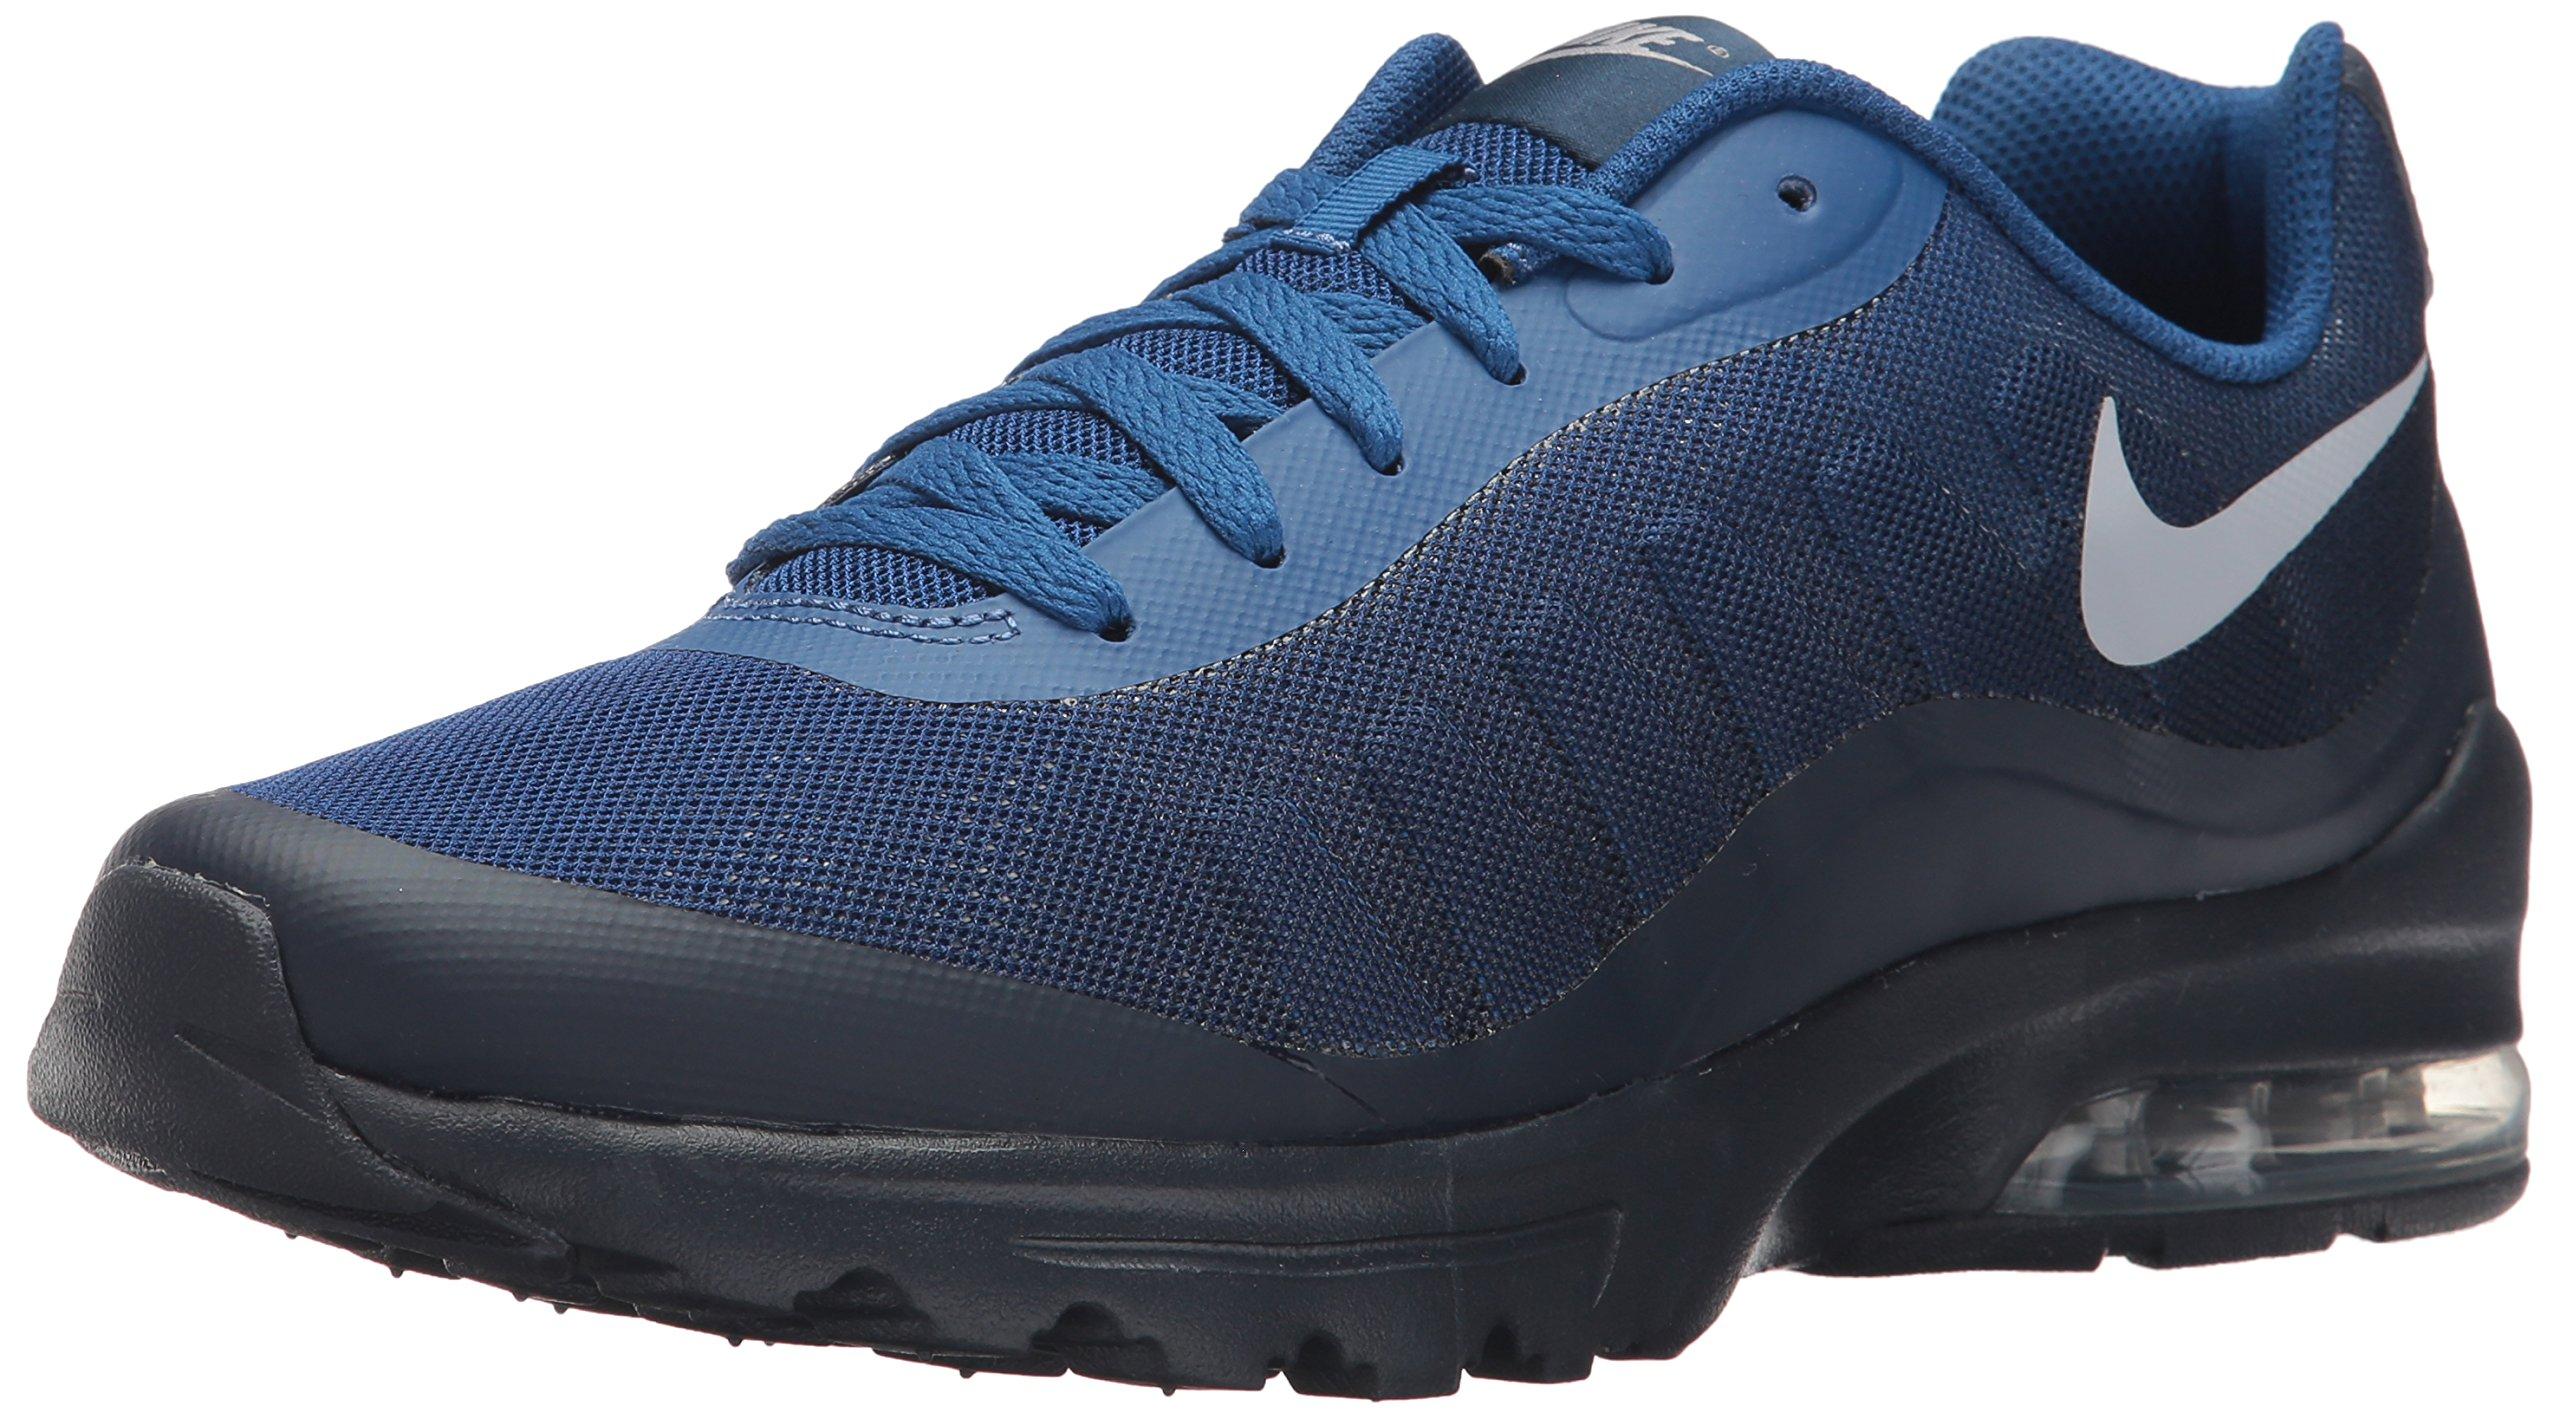 Air Max Invigor Print Running Shoe, Gym